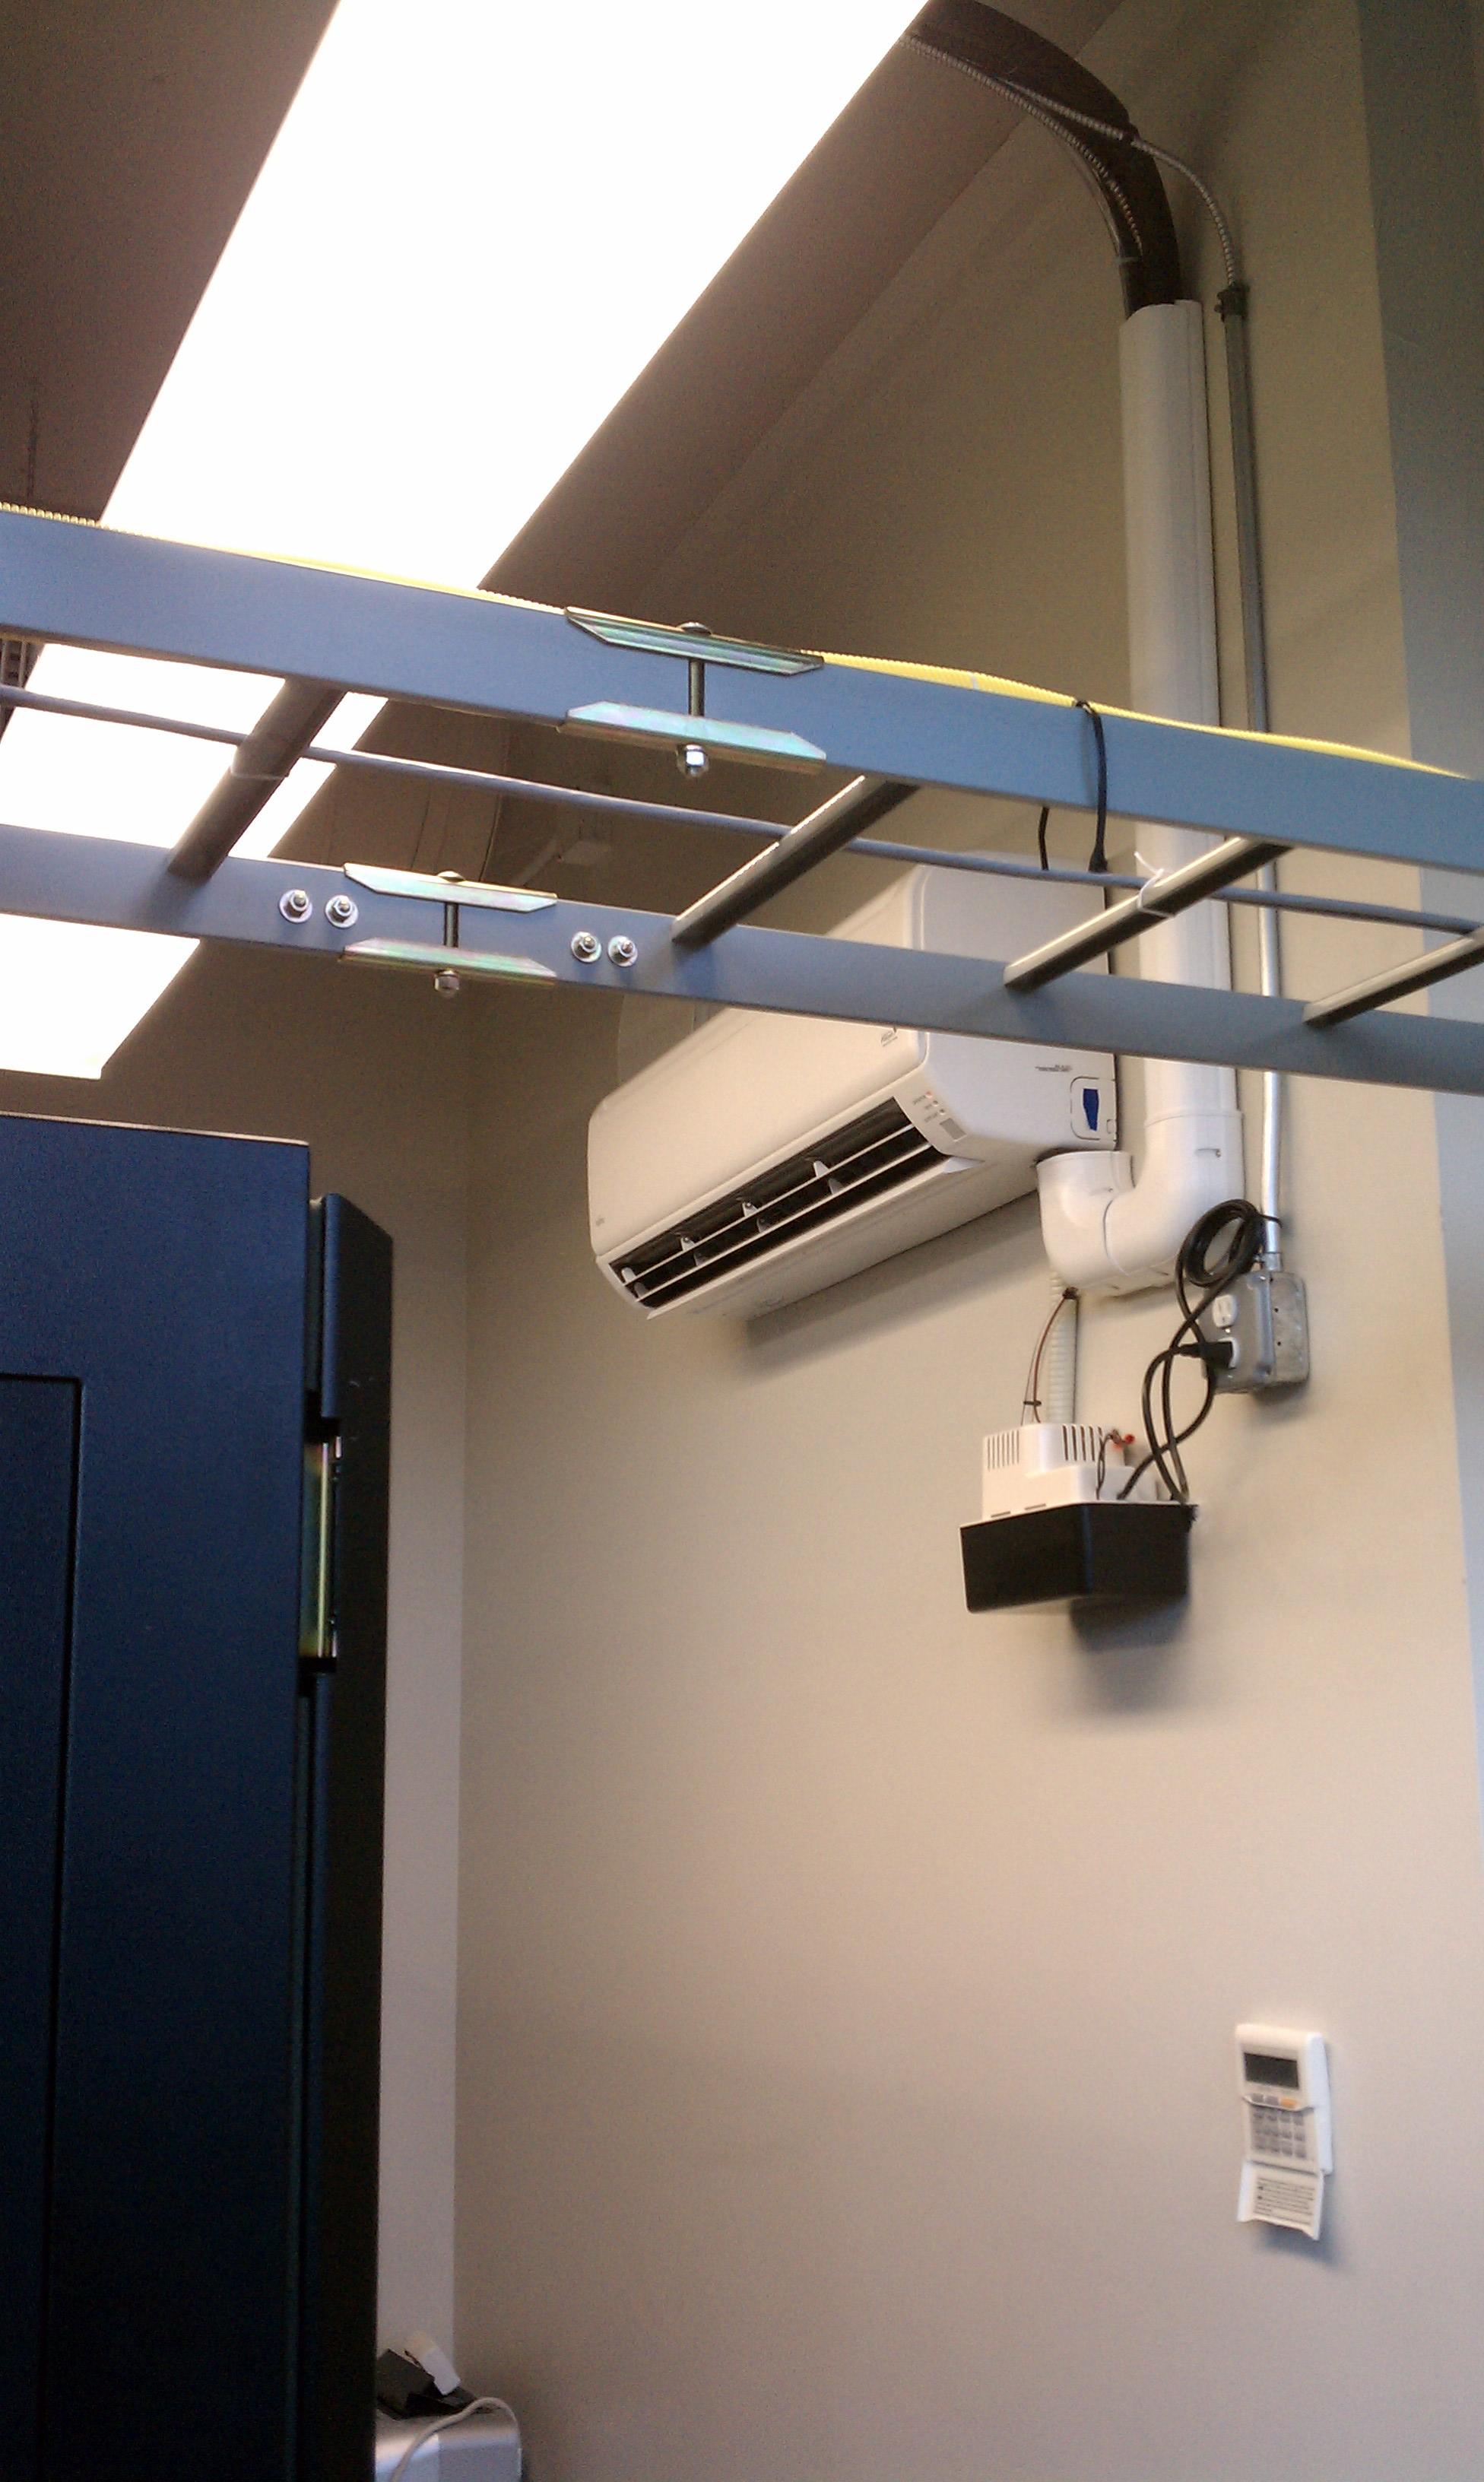 Mini Split Air Conditioning Systems By Fujitsu Steve's Blog #866645